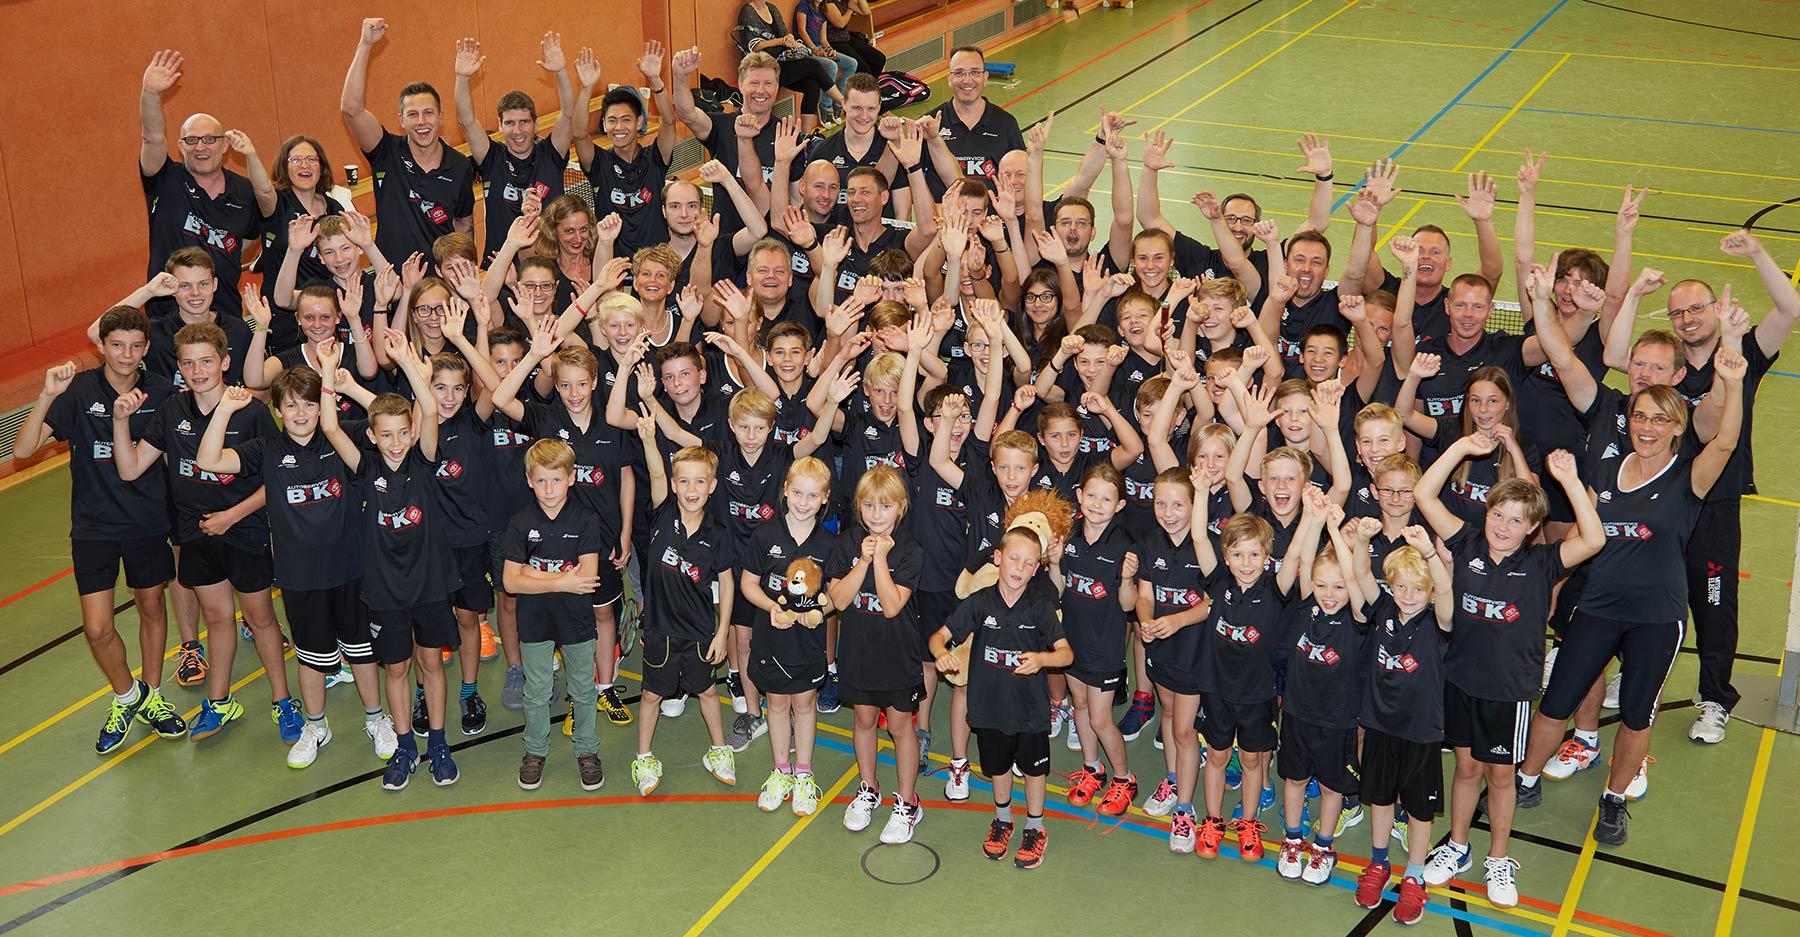 TSV-Gruppenfoto_Badminton